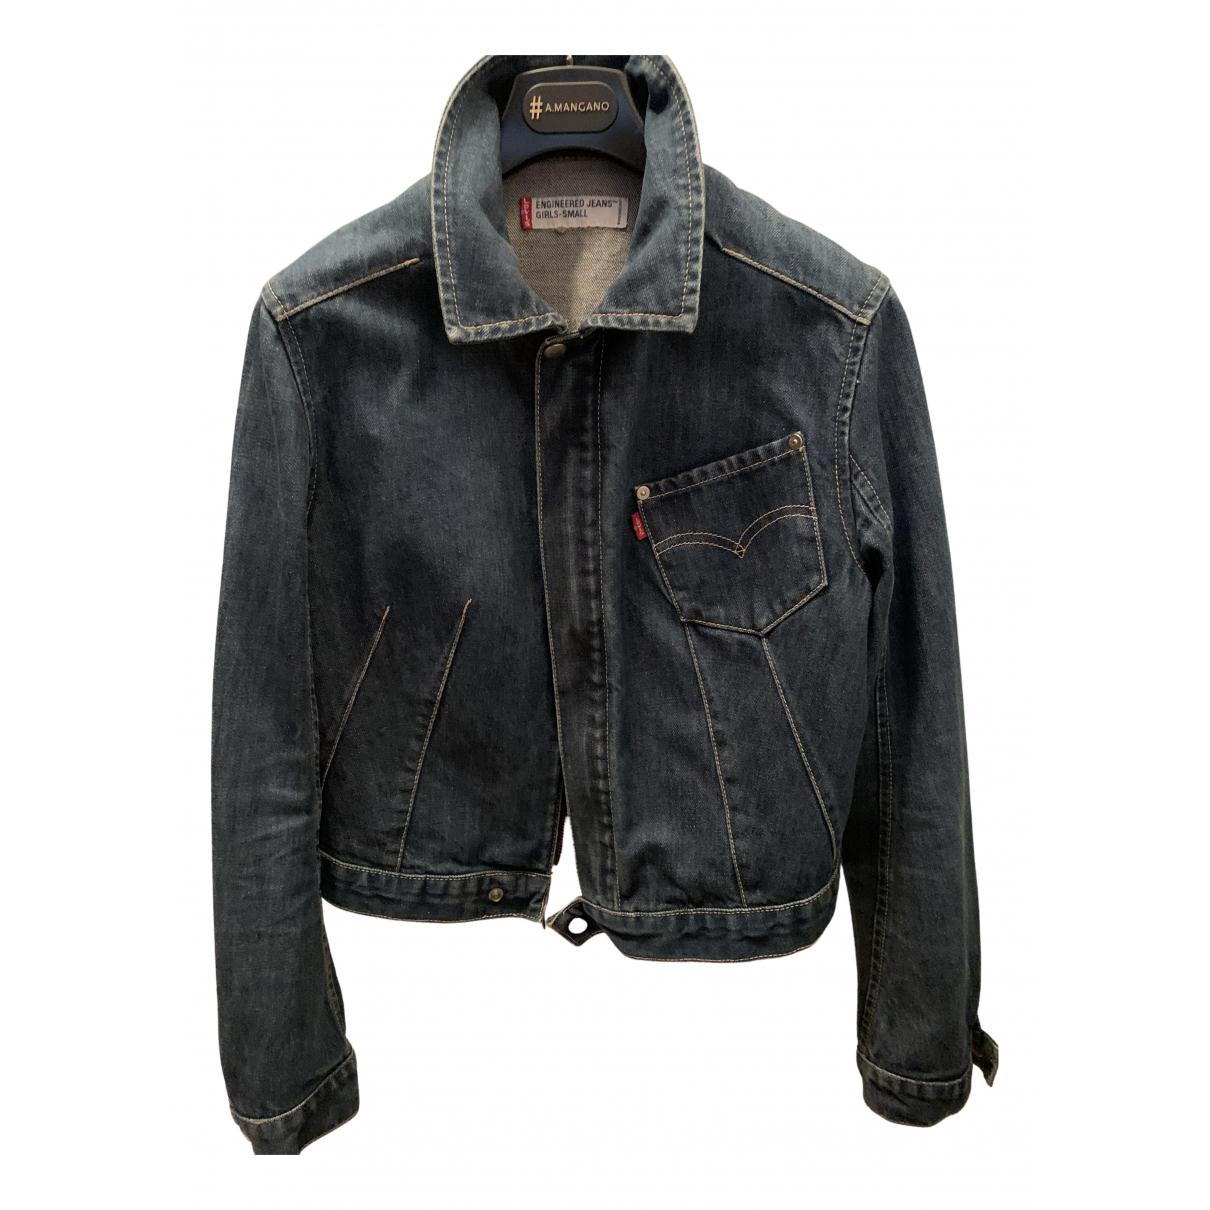 Levi's Vintage Clothing \N Denim - Jeans jacket for Women 42 IT